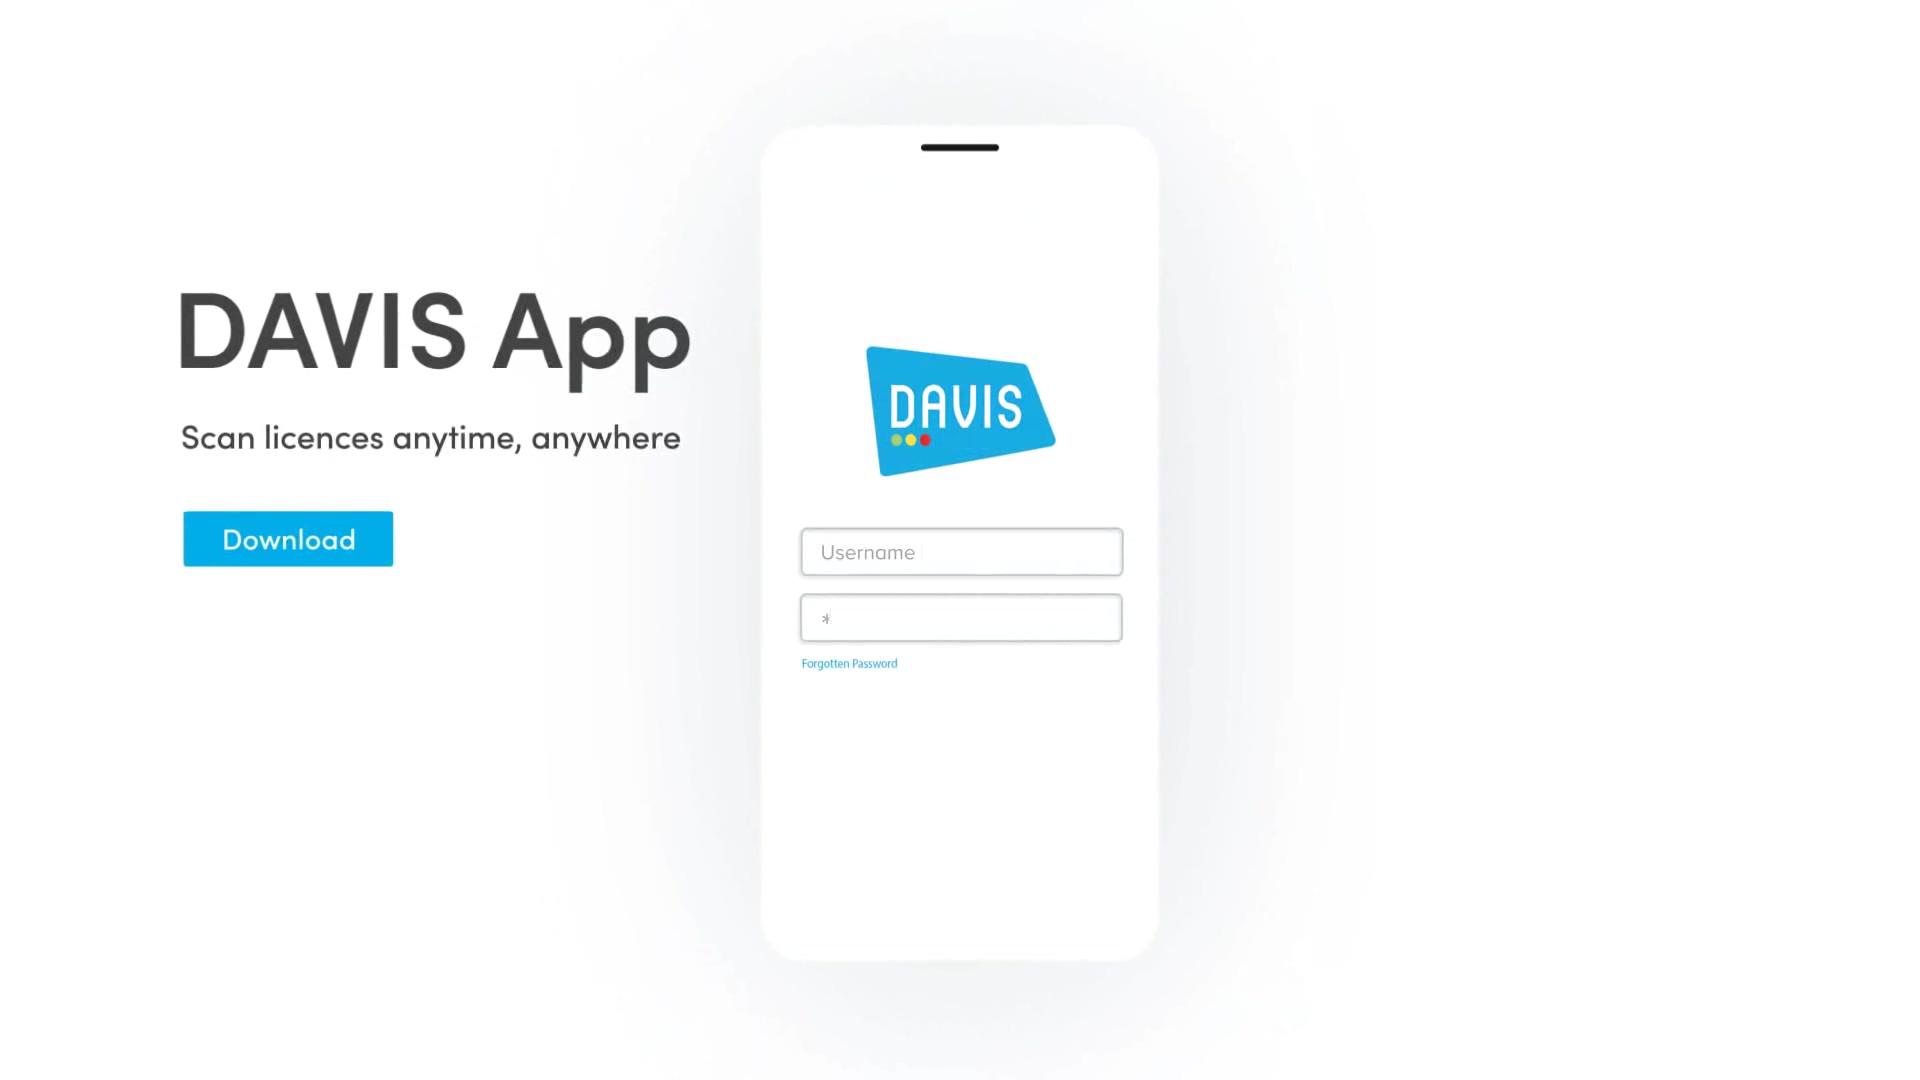 DAVIS App Promo 2020